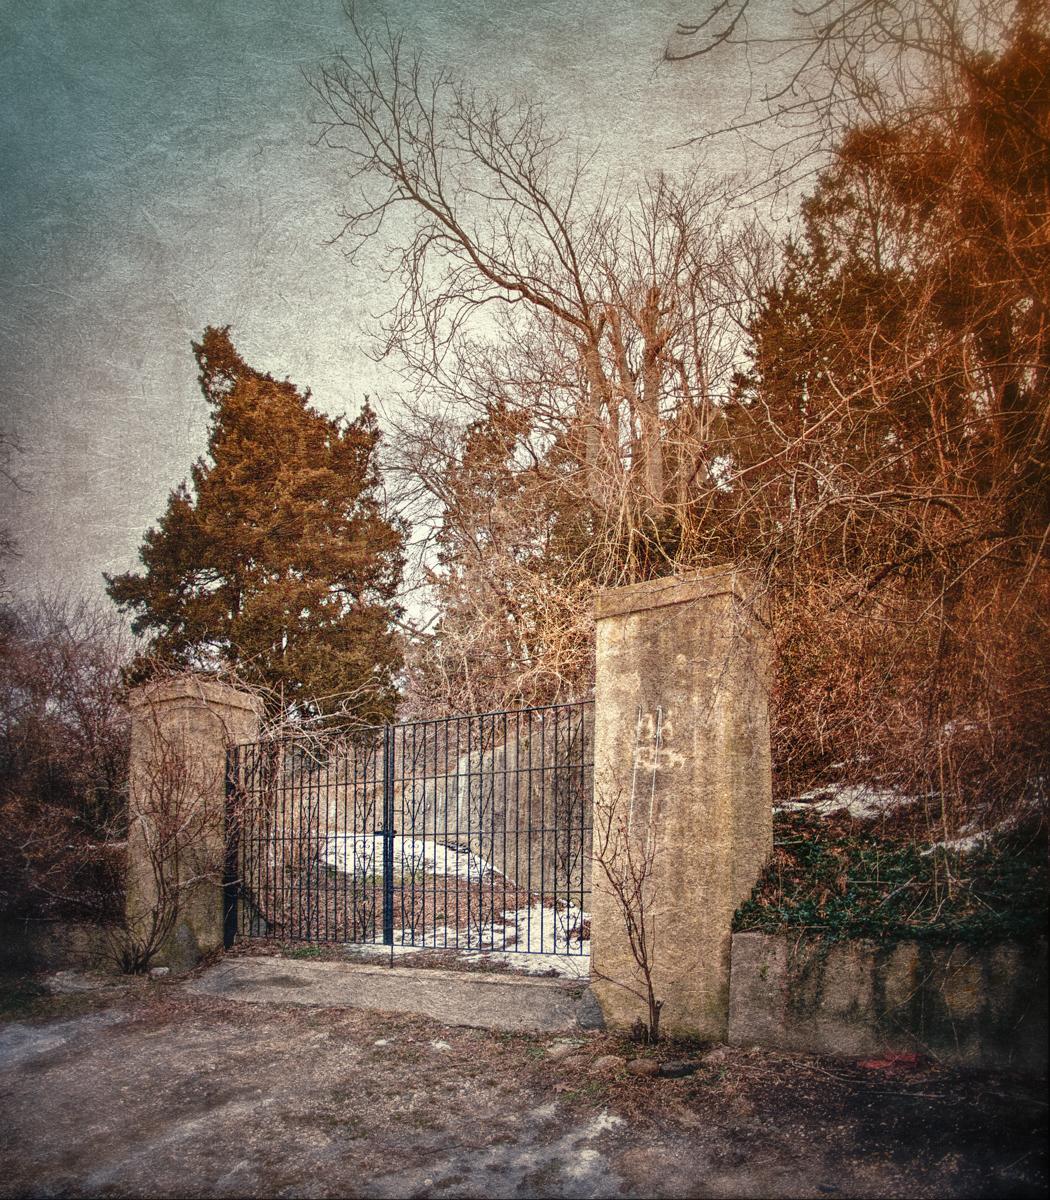 The gates to Ferguson's Castle on Long Island's Gold Coast